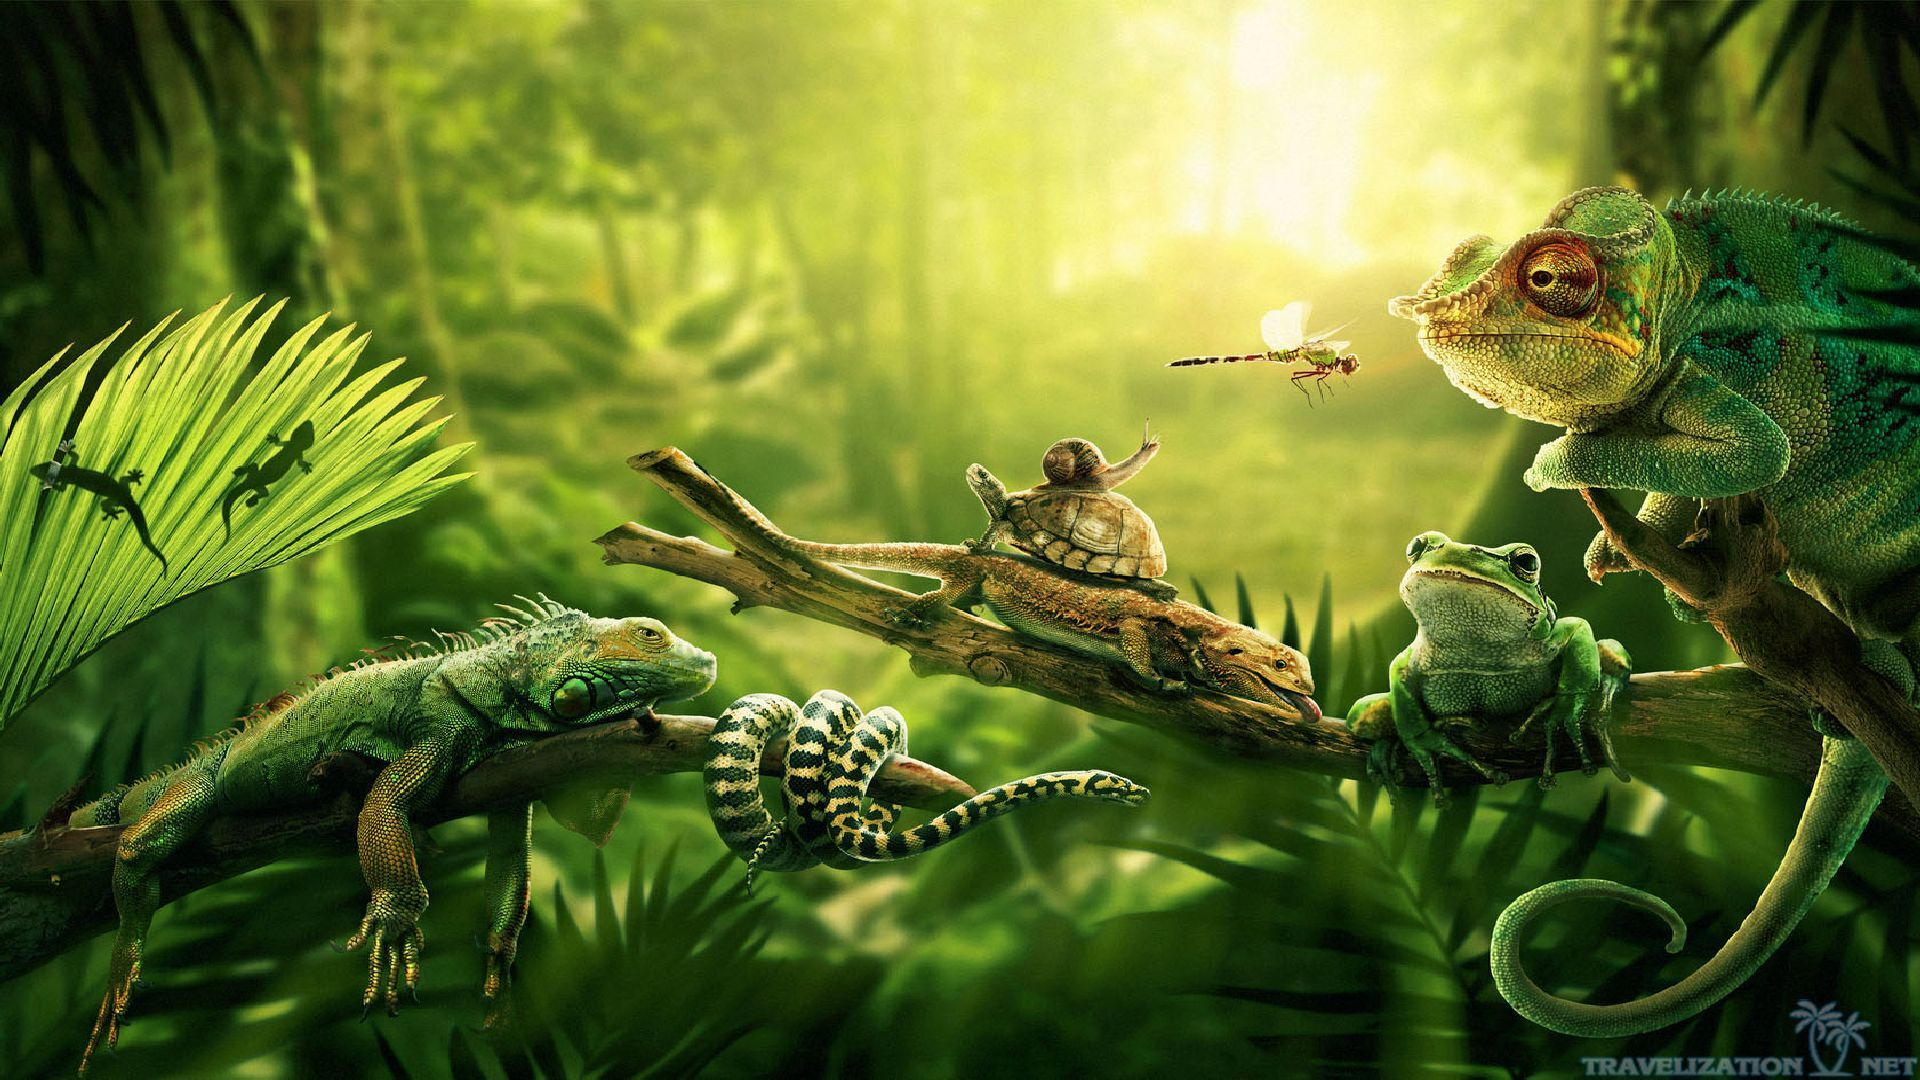 Amazon Rainforest Wallpaper Full HD bGn Earth